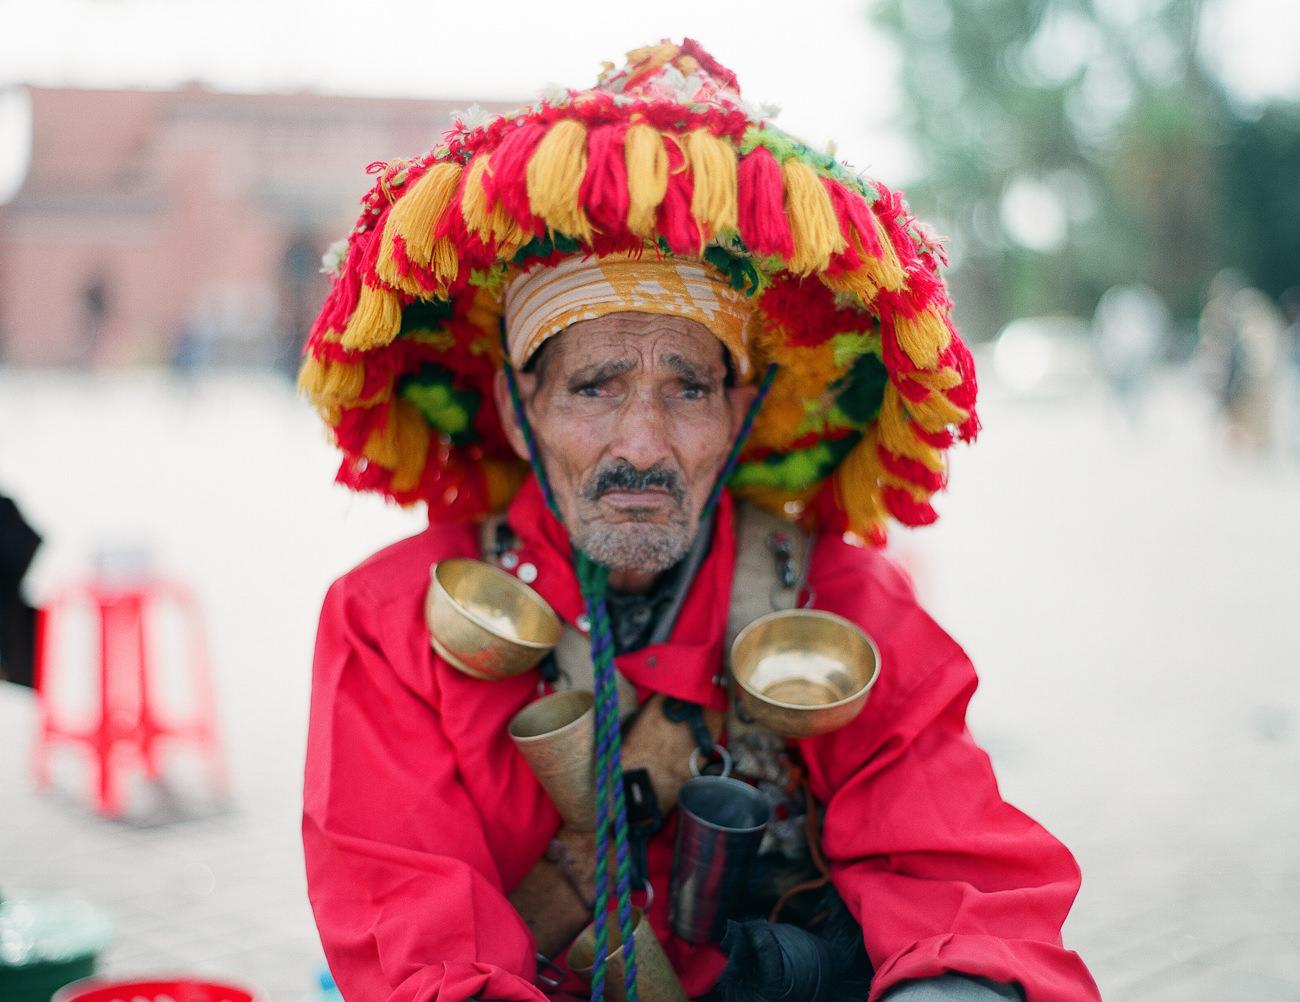 marrakech-photographe-voyage-alain-m-12.jpg